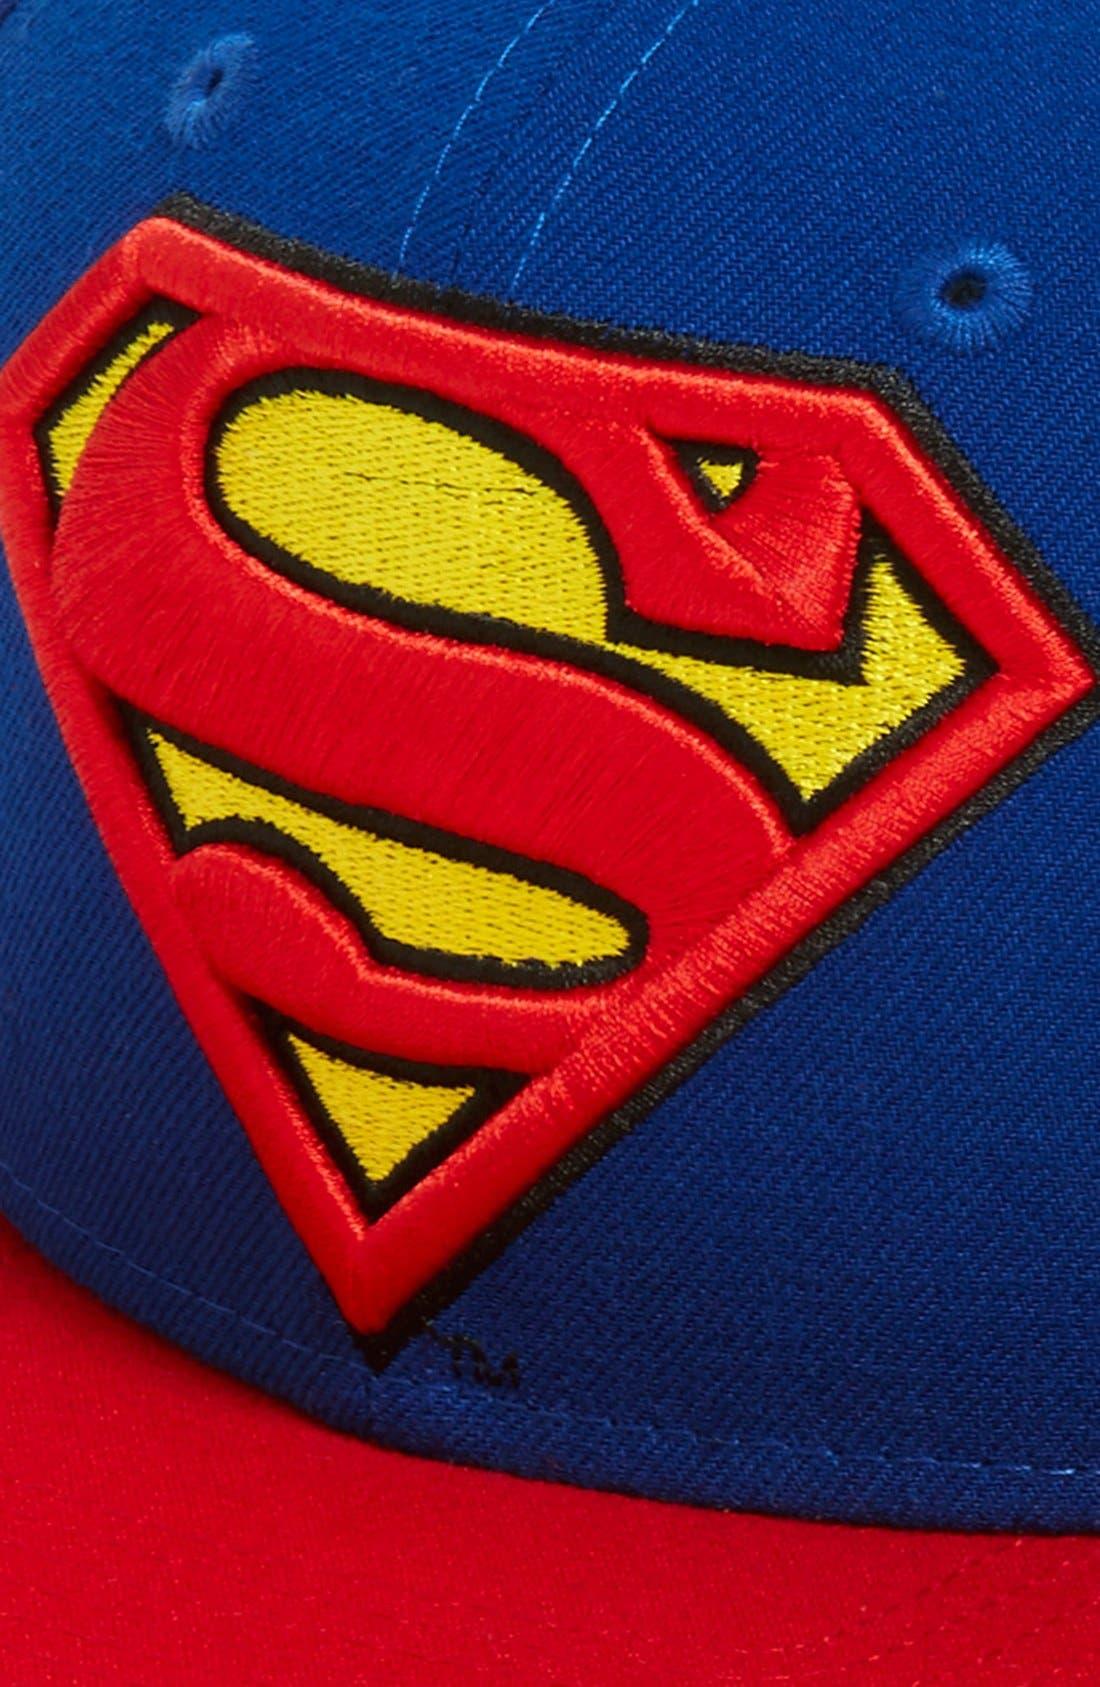 Alternate Image 2  - New Era Cap 'Superman' Snapback Cap